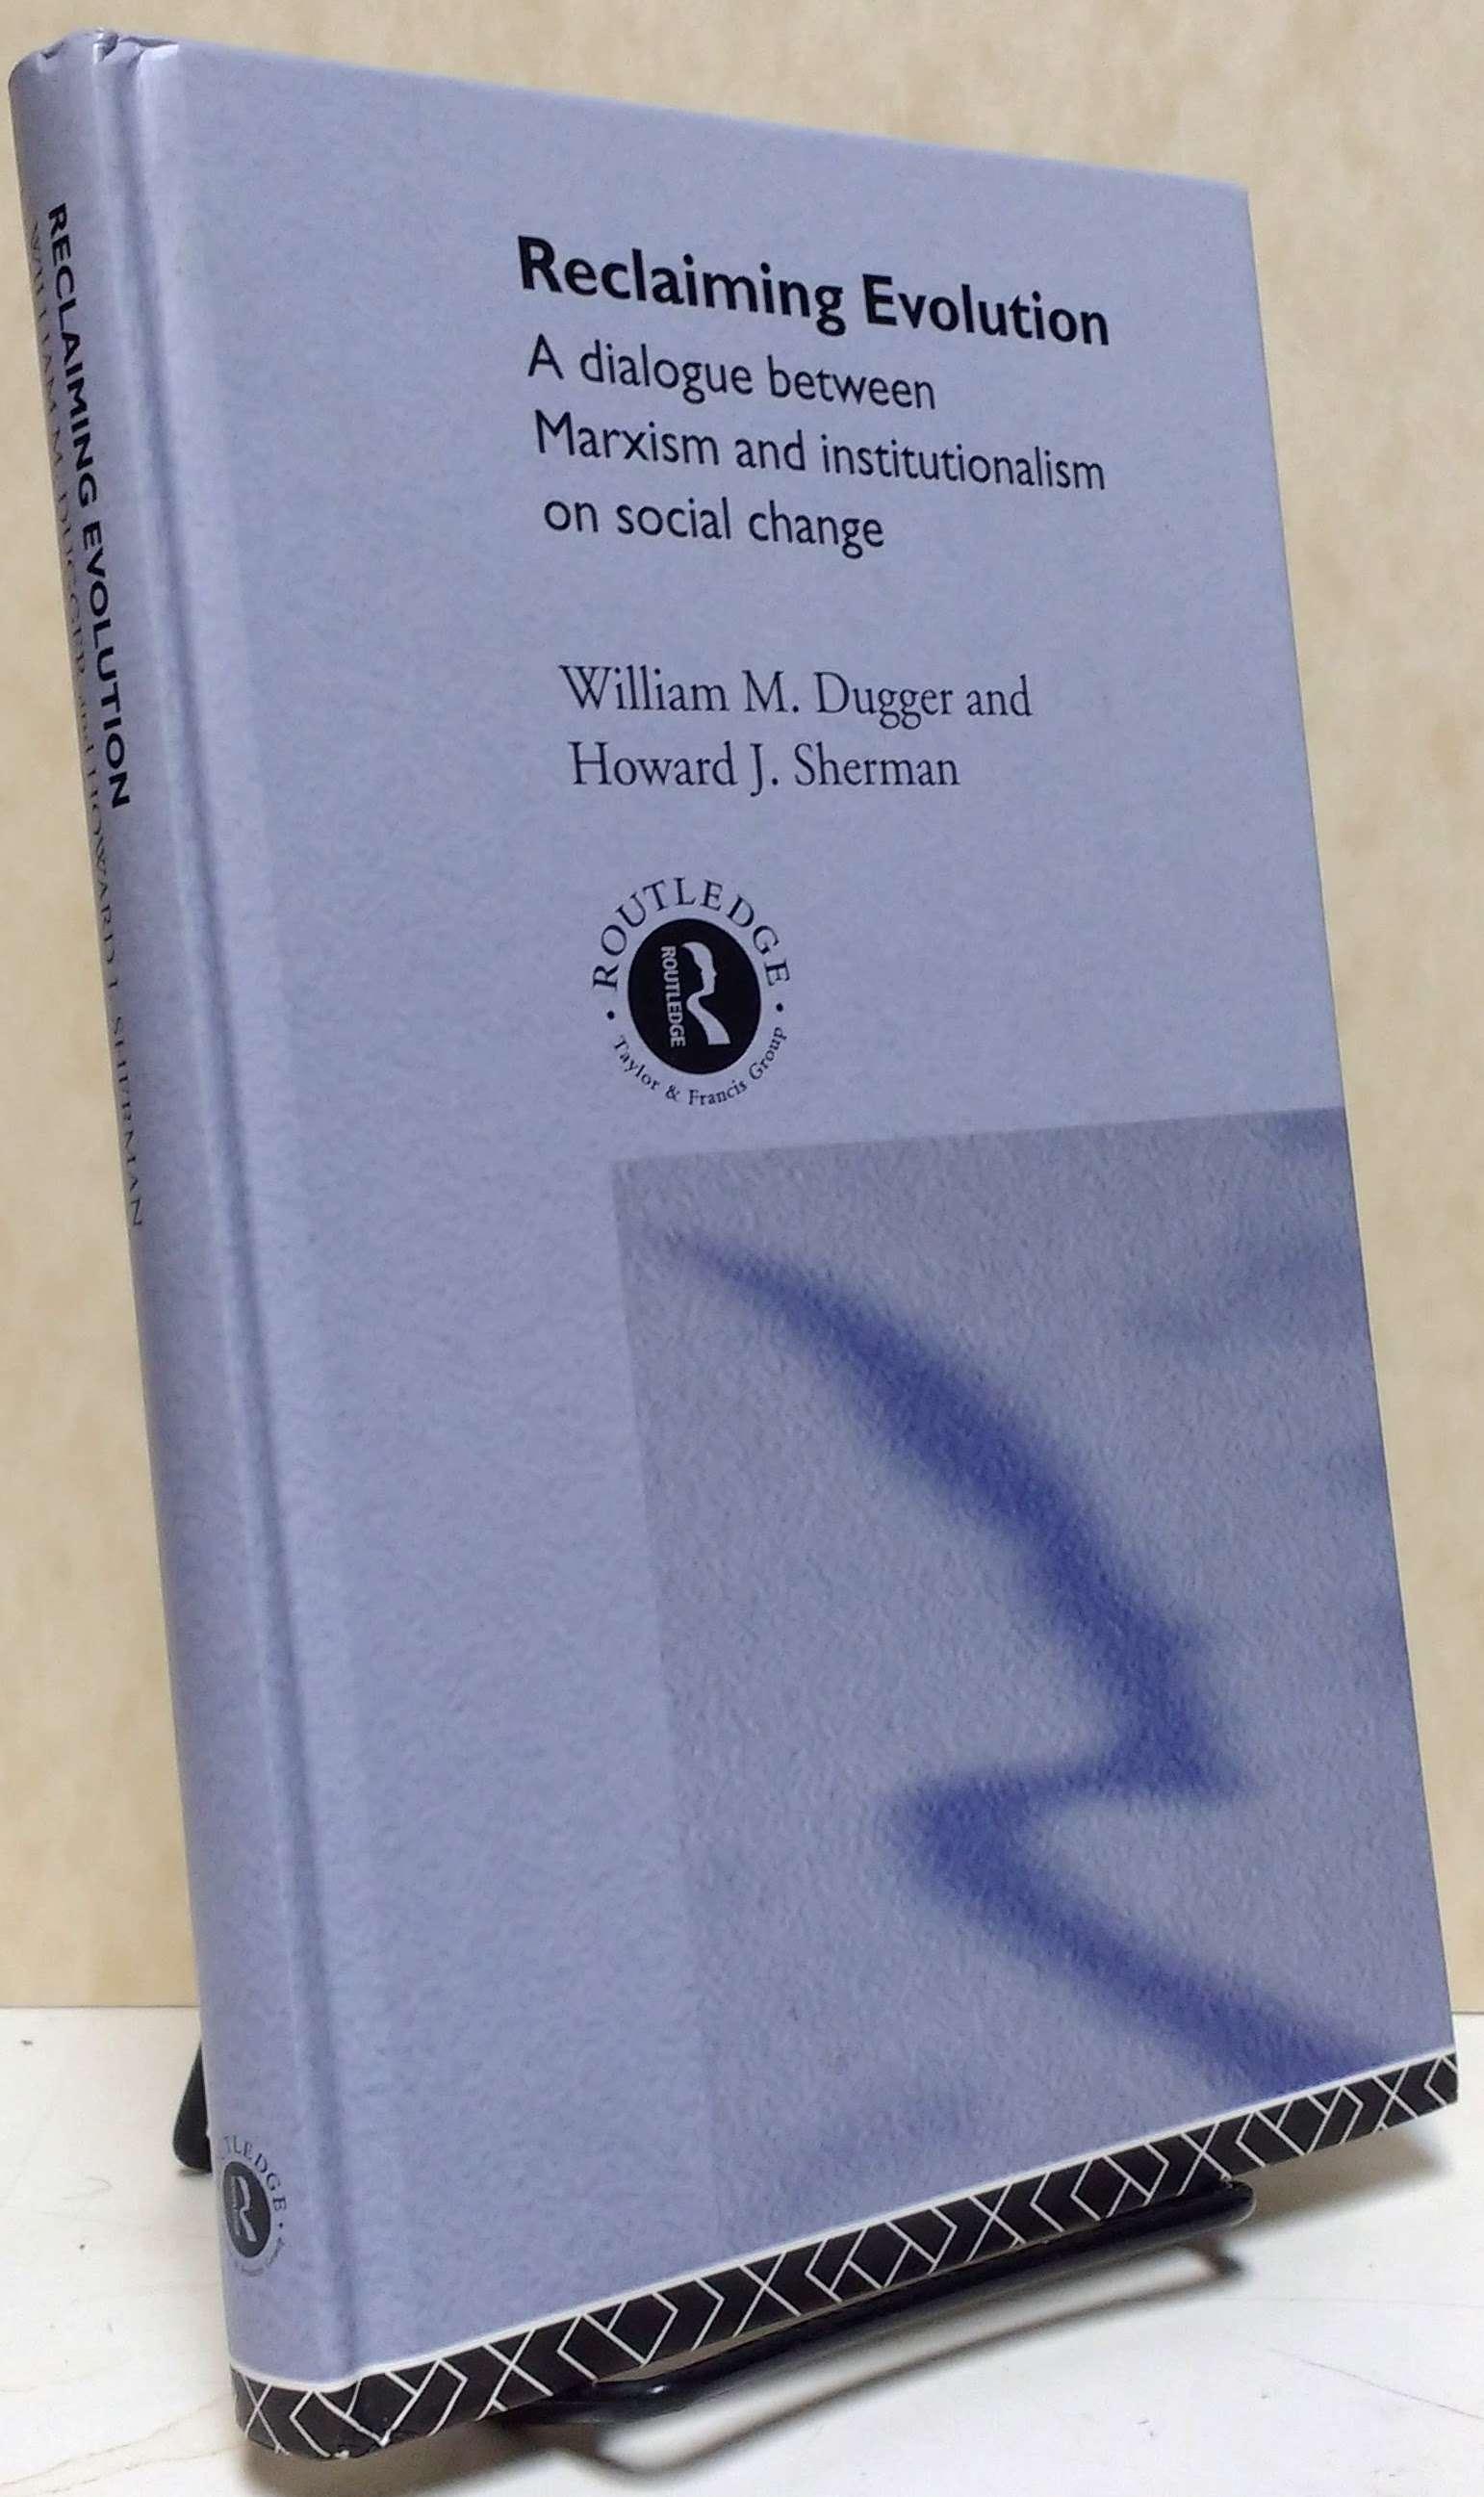 Reclaiming Evolution: A Marxist Institutionalist Dialogue on Social Change  (Advances in Social Economics), William M. Dugger; Howard J. Sherman